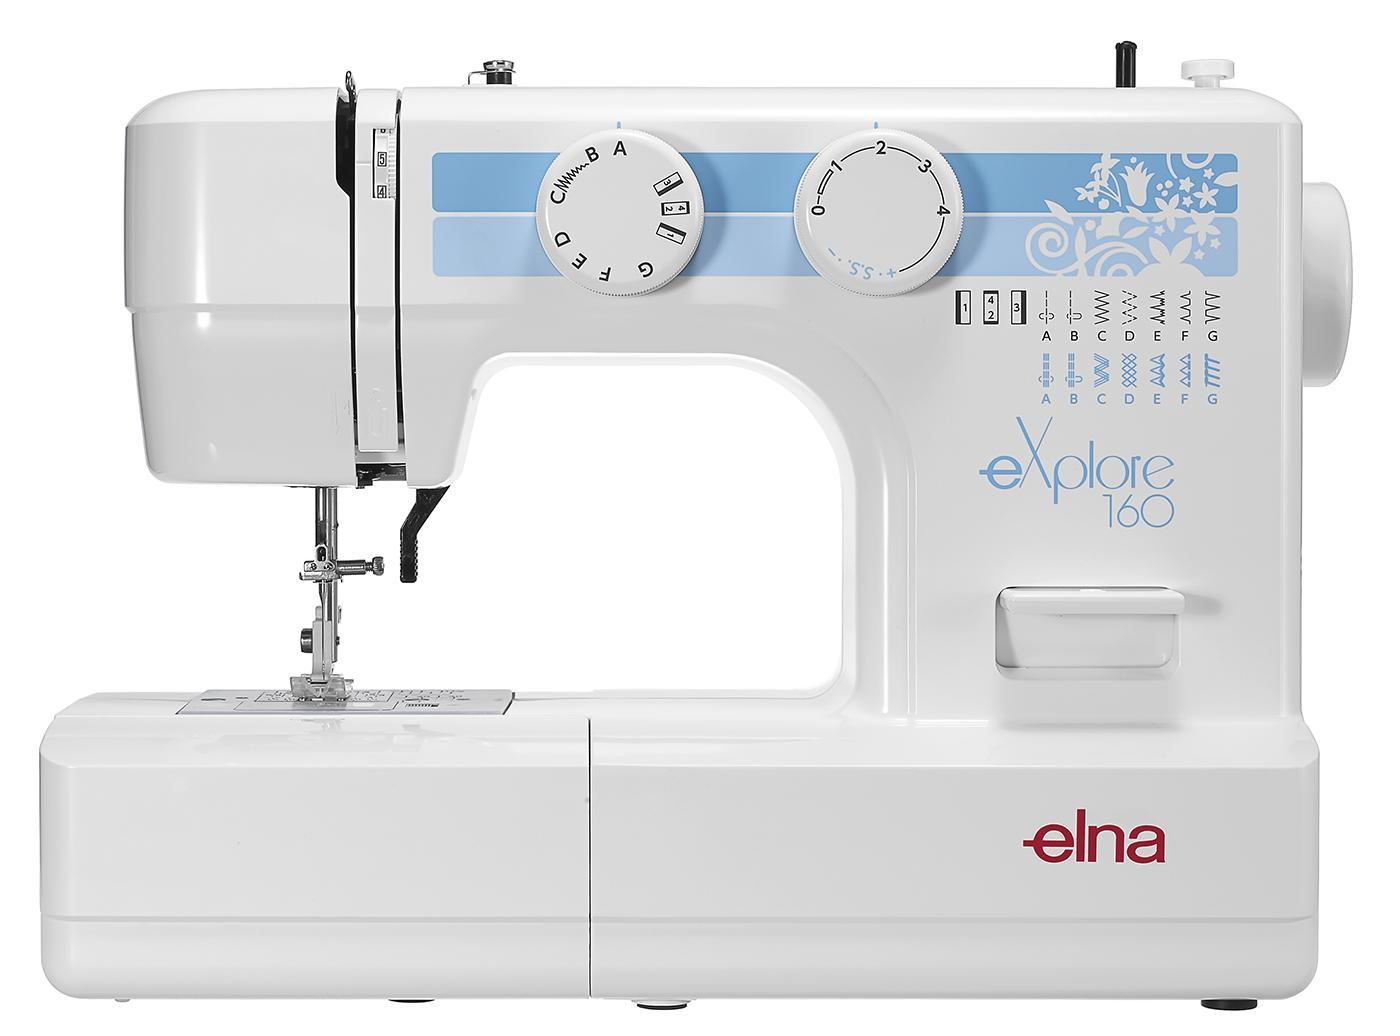 šicí stroj Elna eXplore 160